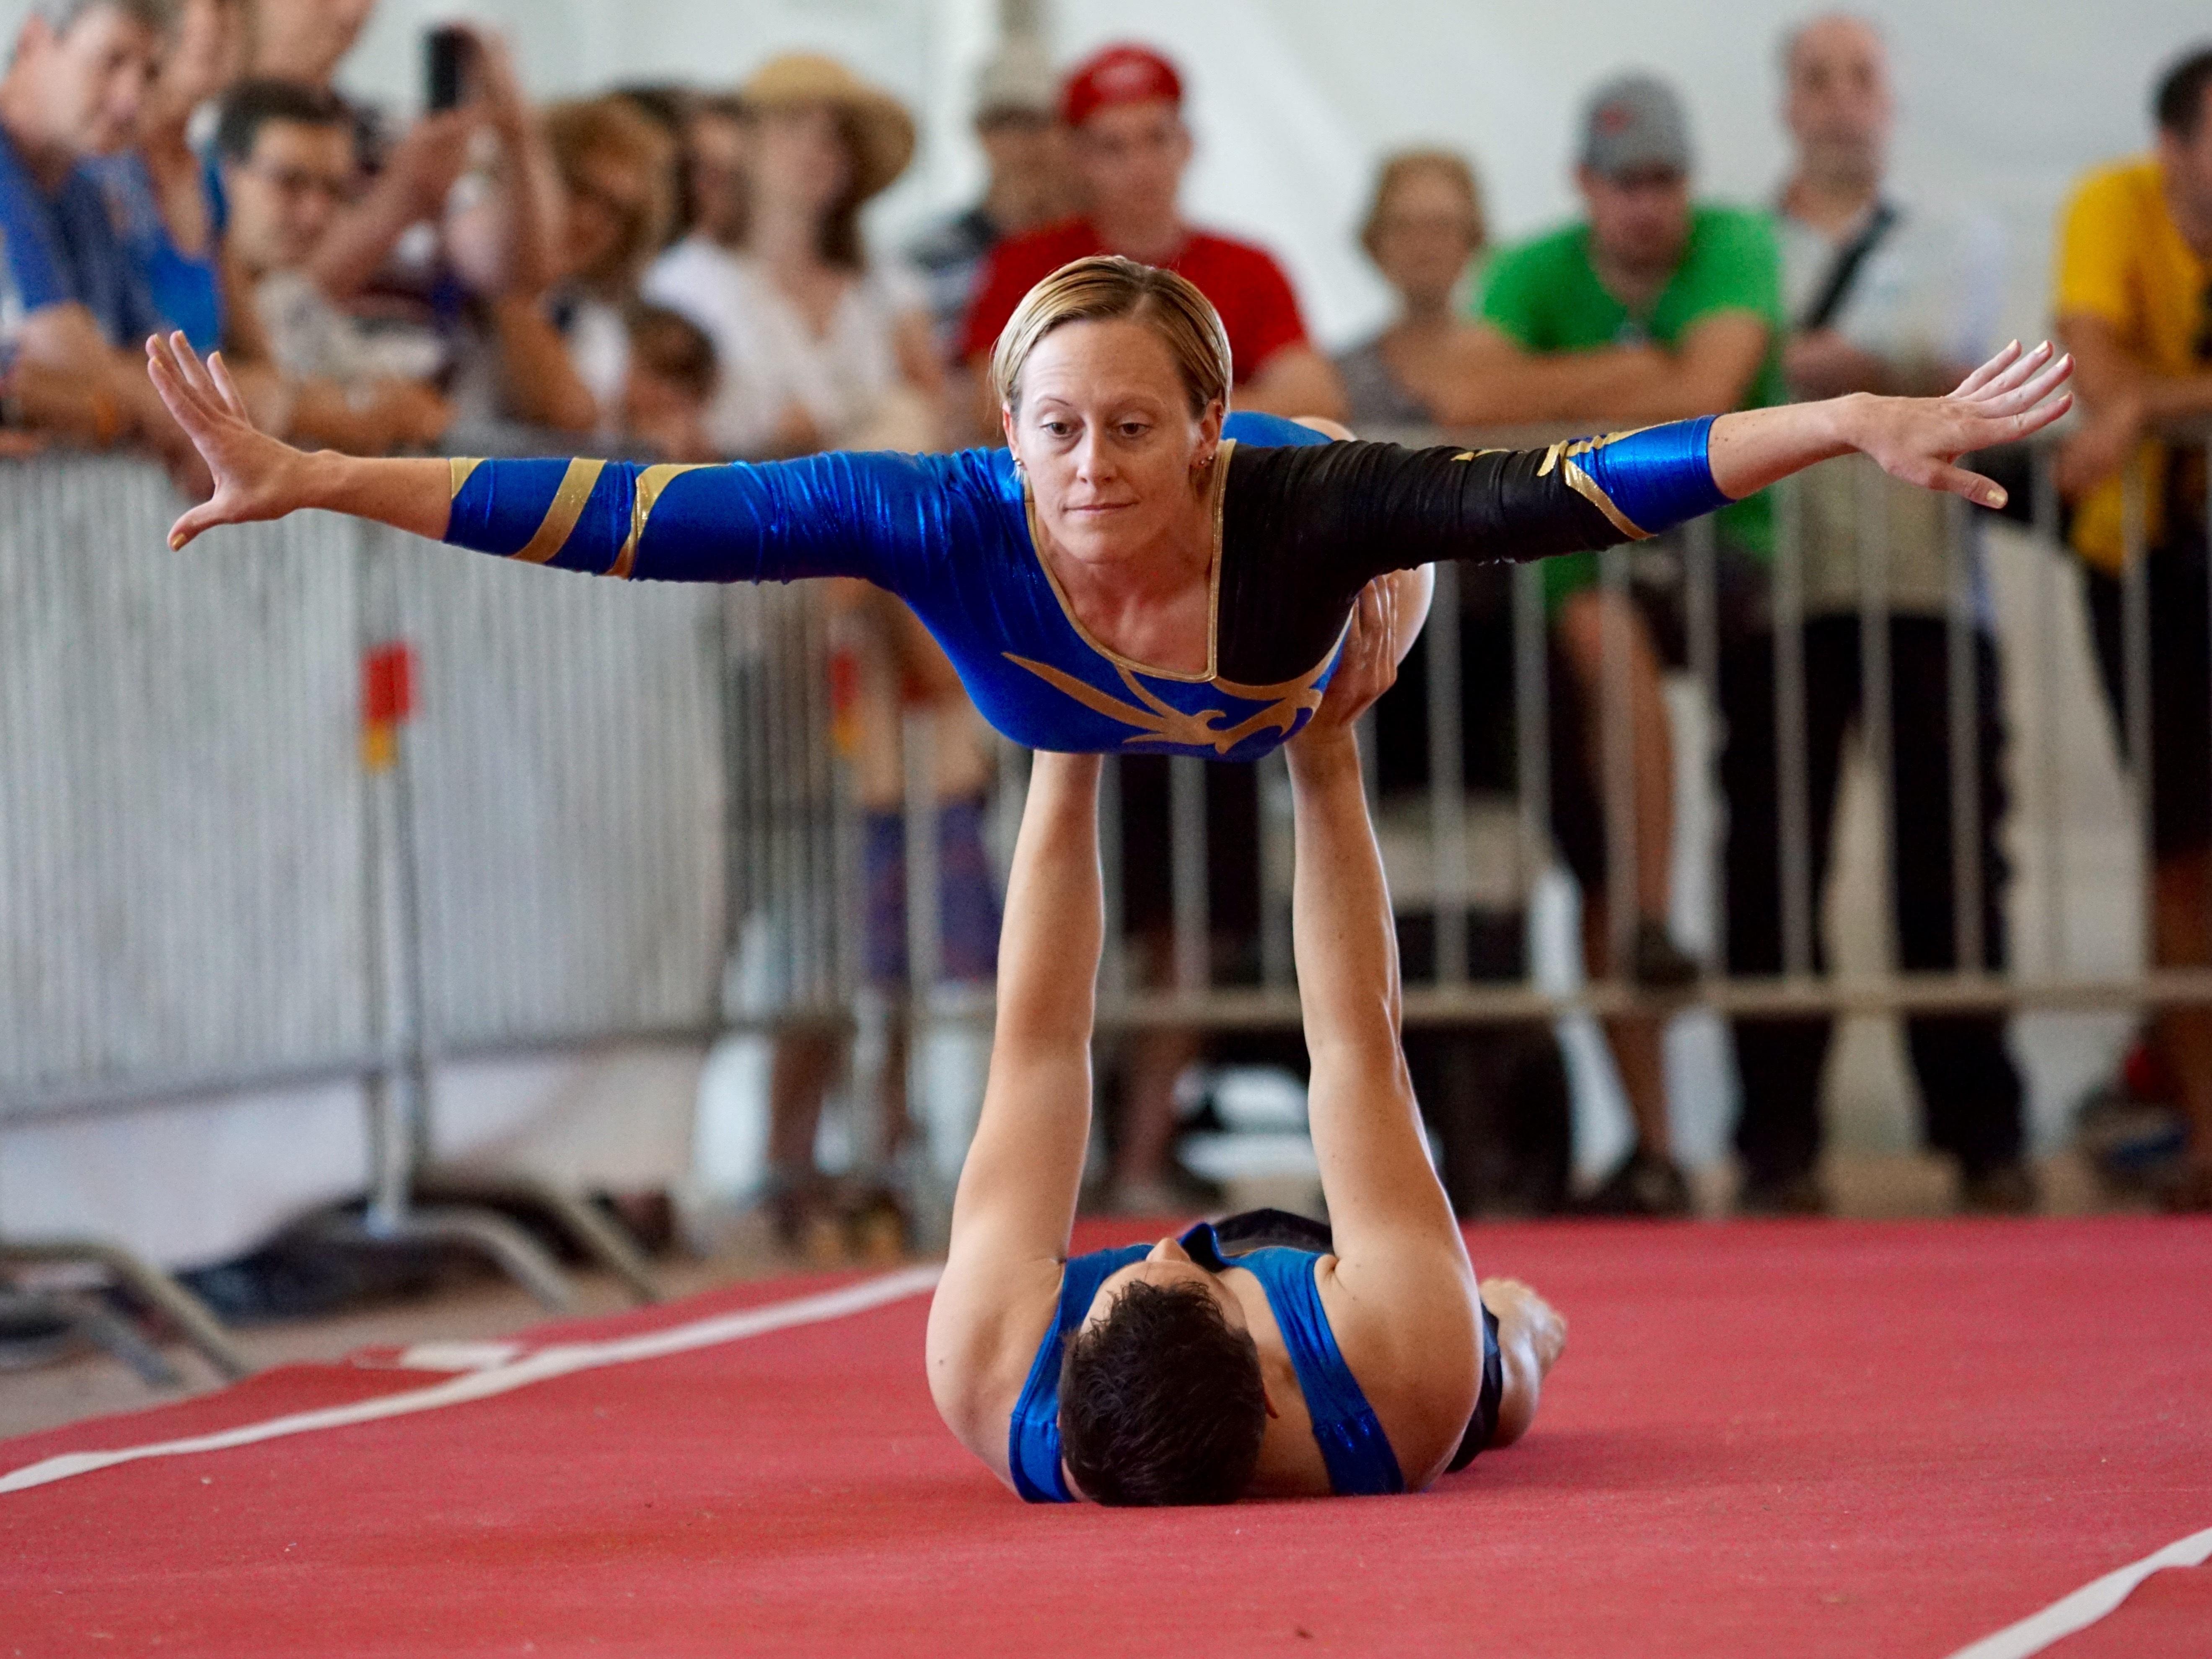 Fotos gratis competencia deportes atletismo gimnasia for Ejercicios de gimnasia